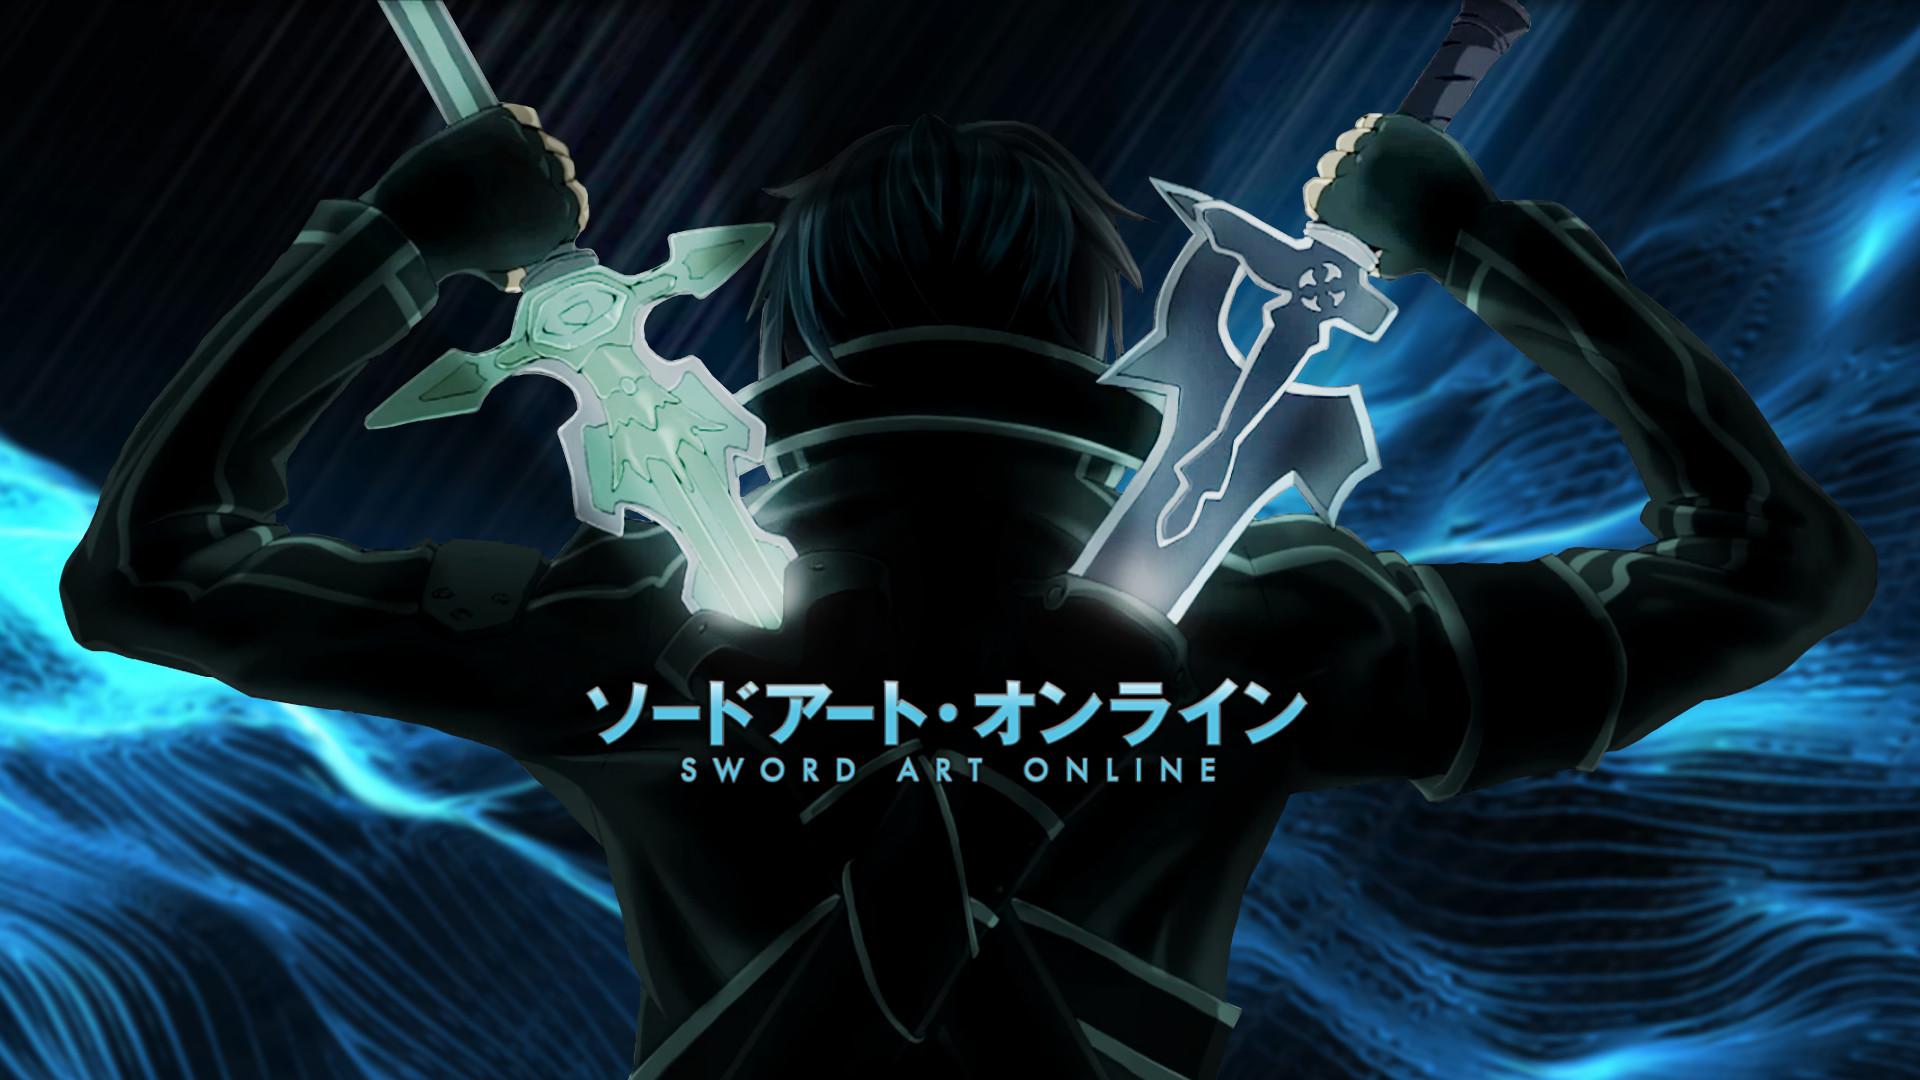 Anime – Sword Art Online Kazuto Kirigaya Kirito (Sword Art Online) Wallpaper